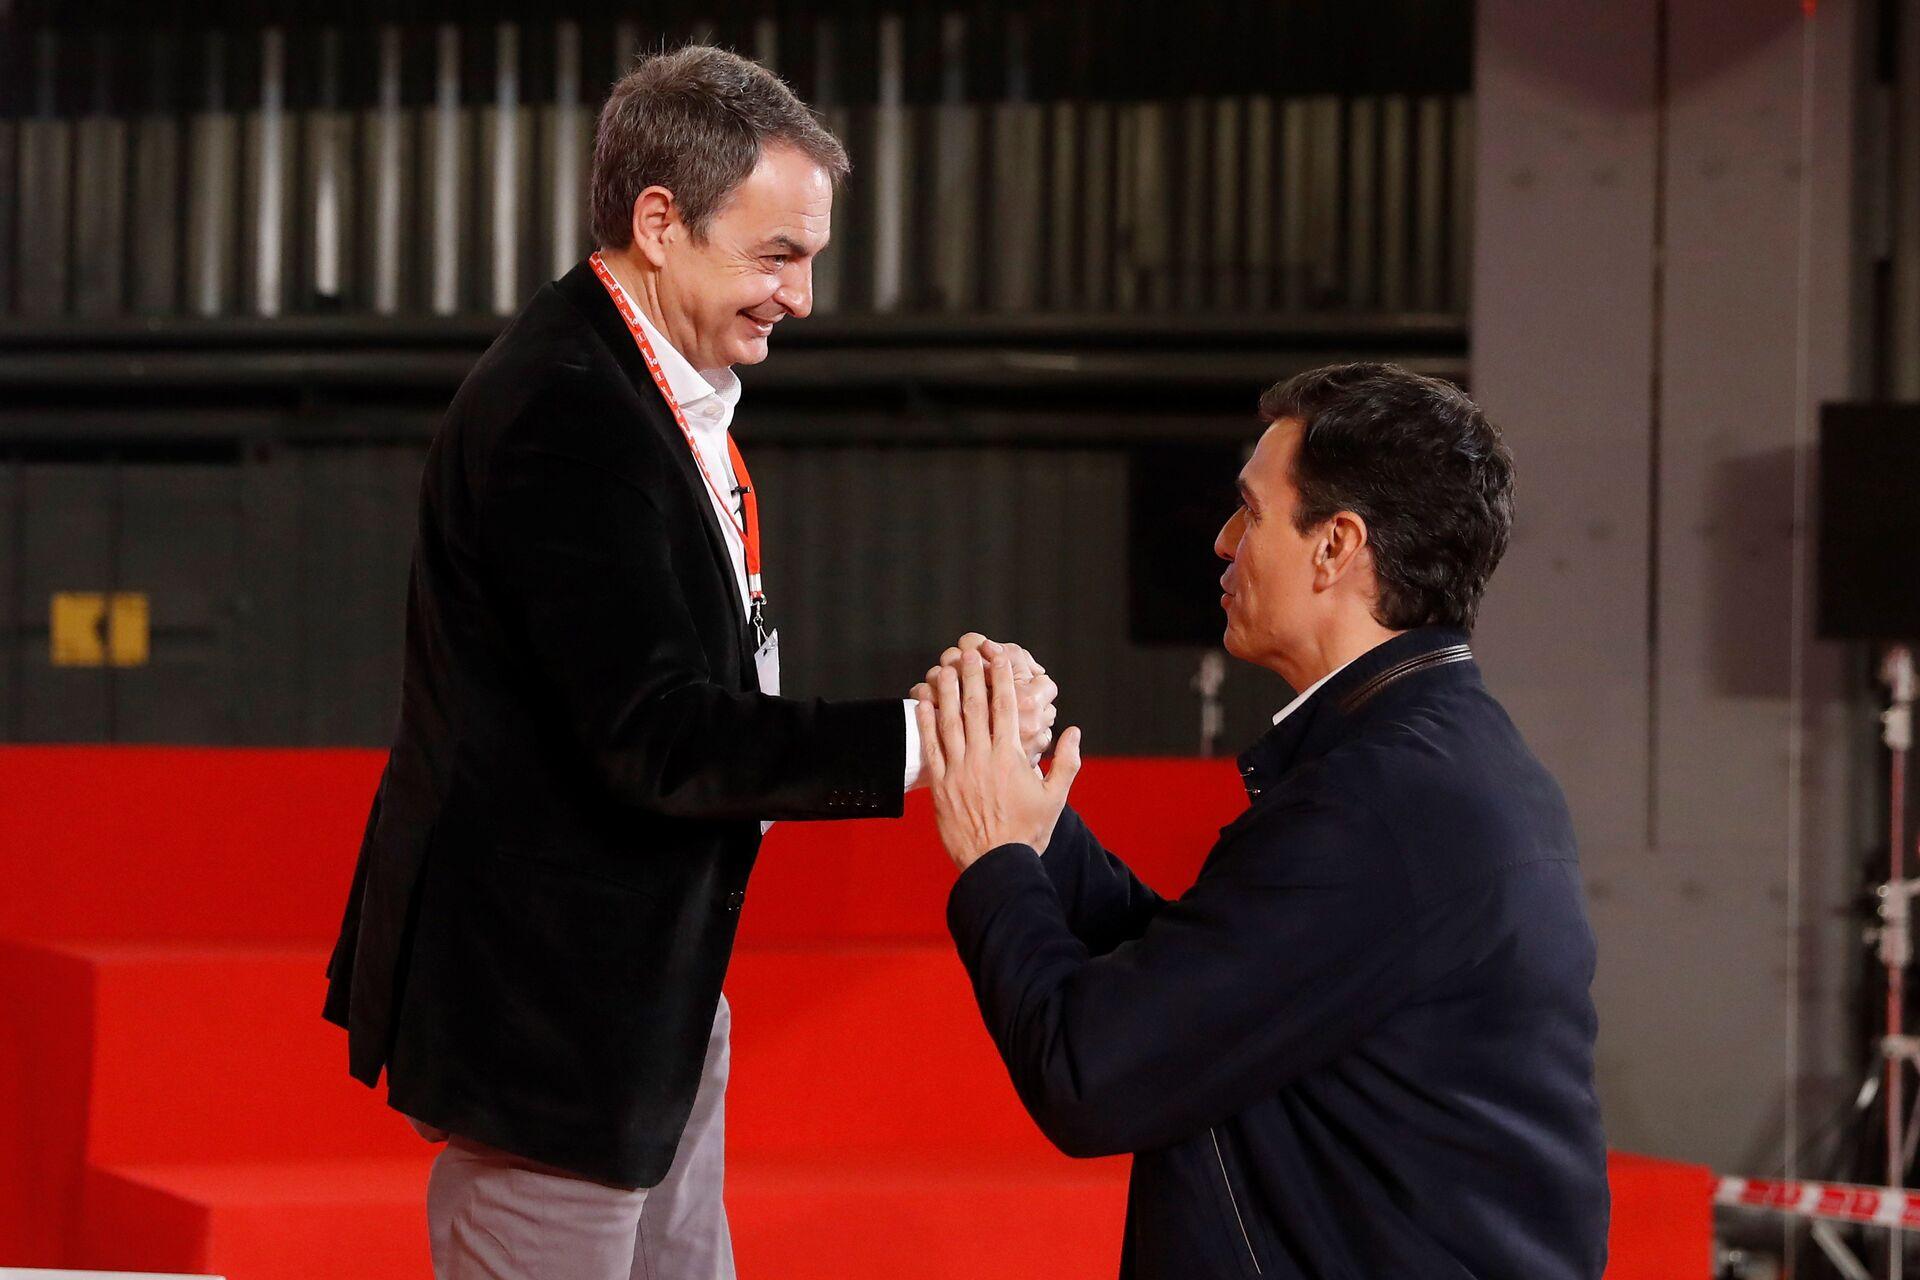 Zapatero en Bolivia o la diplomacia enmascarada de Falconetti y Pablenin - Federico Jiménez Losantos